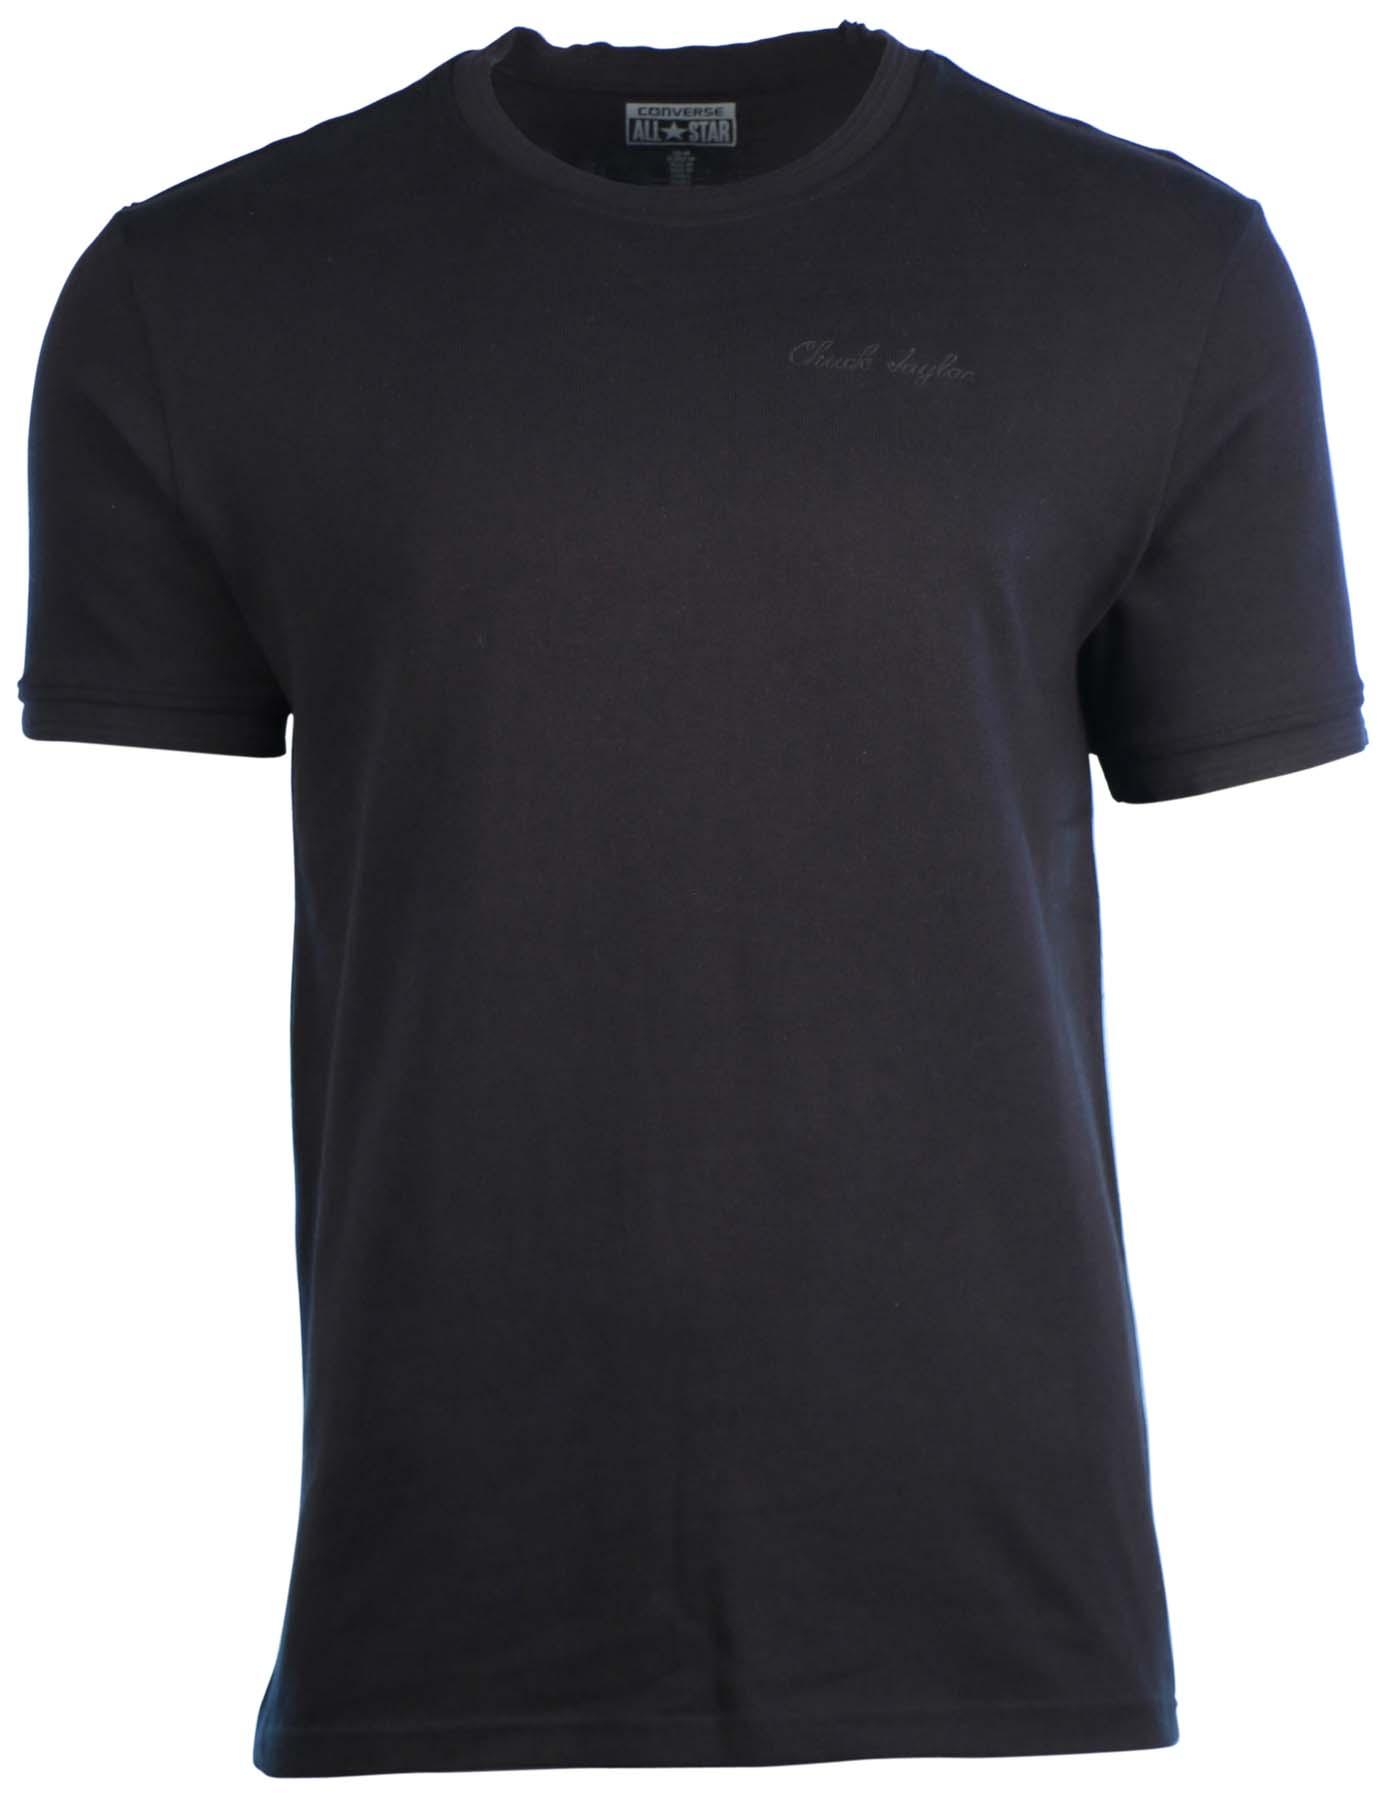 dcb791b080d2 Converse Men s Racked Ringer Chuck Taylor Casual Shirt